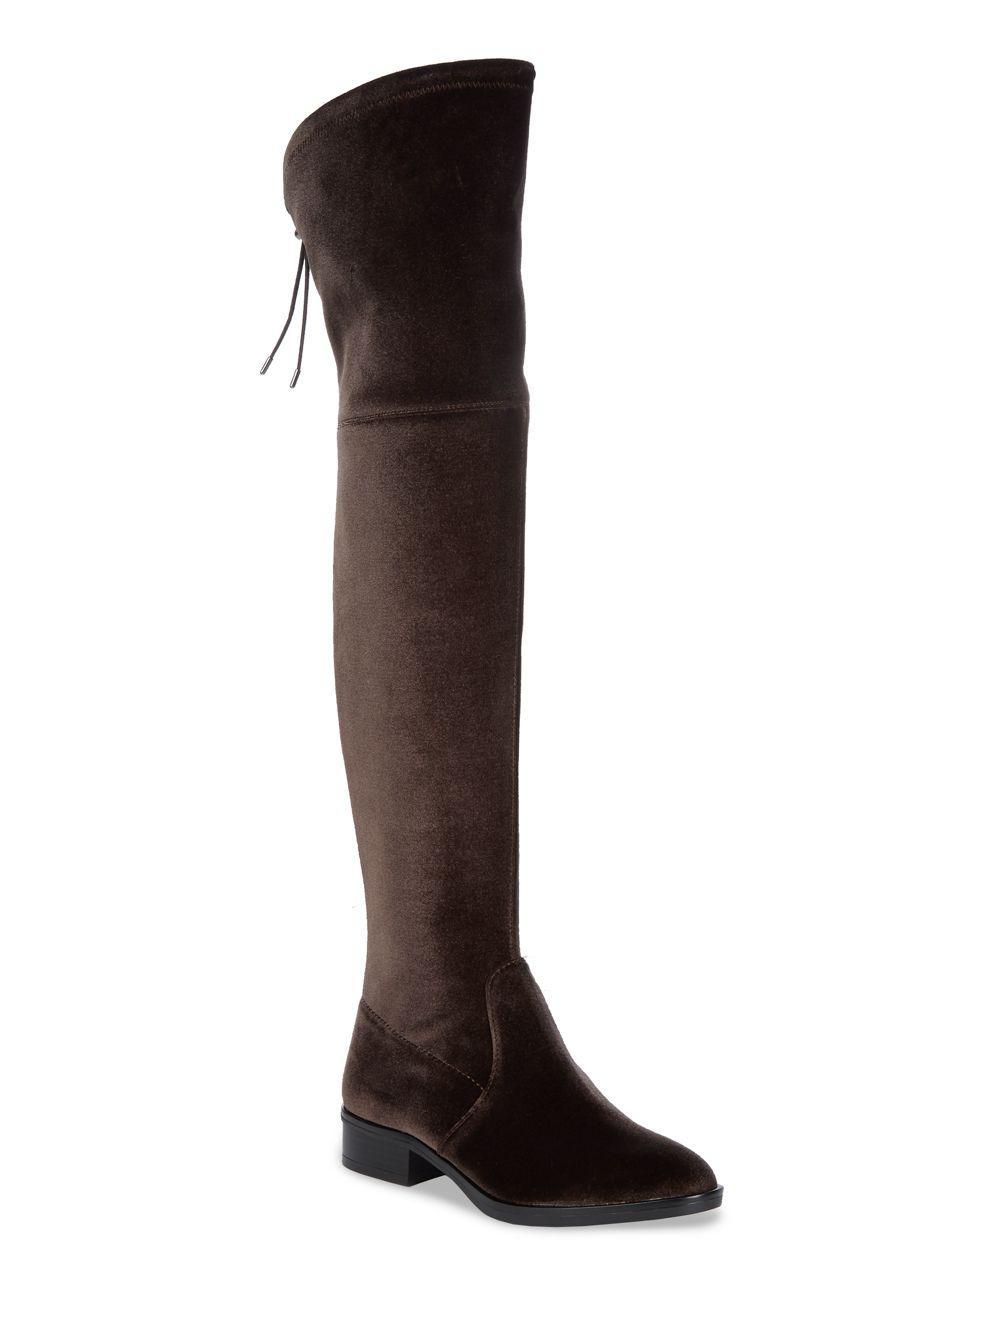 11ffaf3deb6bb8 Sam Edelman Long Velvet Adjustable Boots in Gray - Save 28% - Lyst